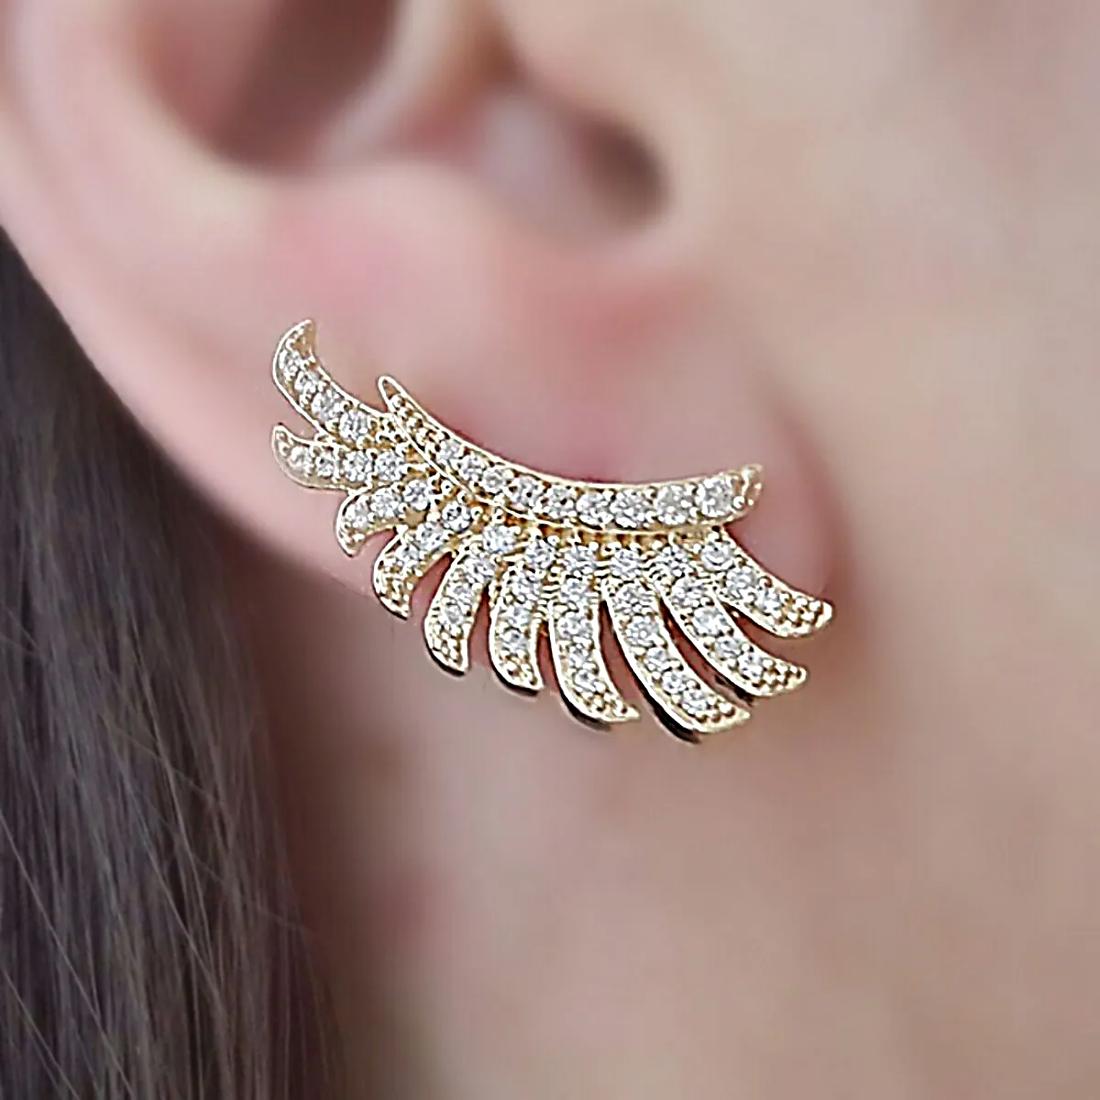 Brinco Ear Cuff Asa Delicado Semijoia em Ouro 18K com Micro Zircônia Branca  - Soloyou